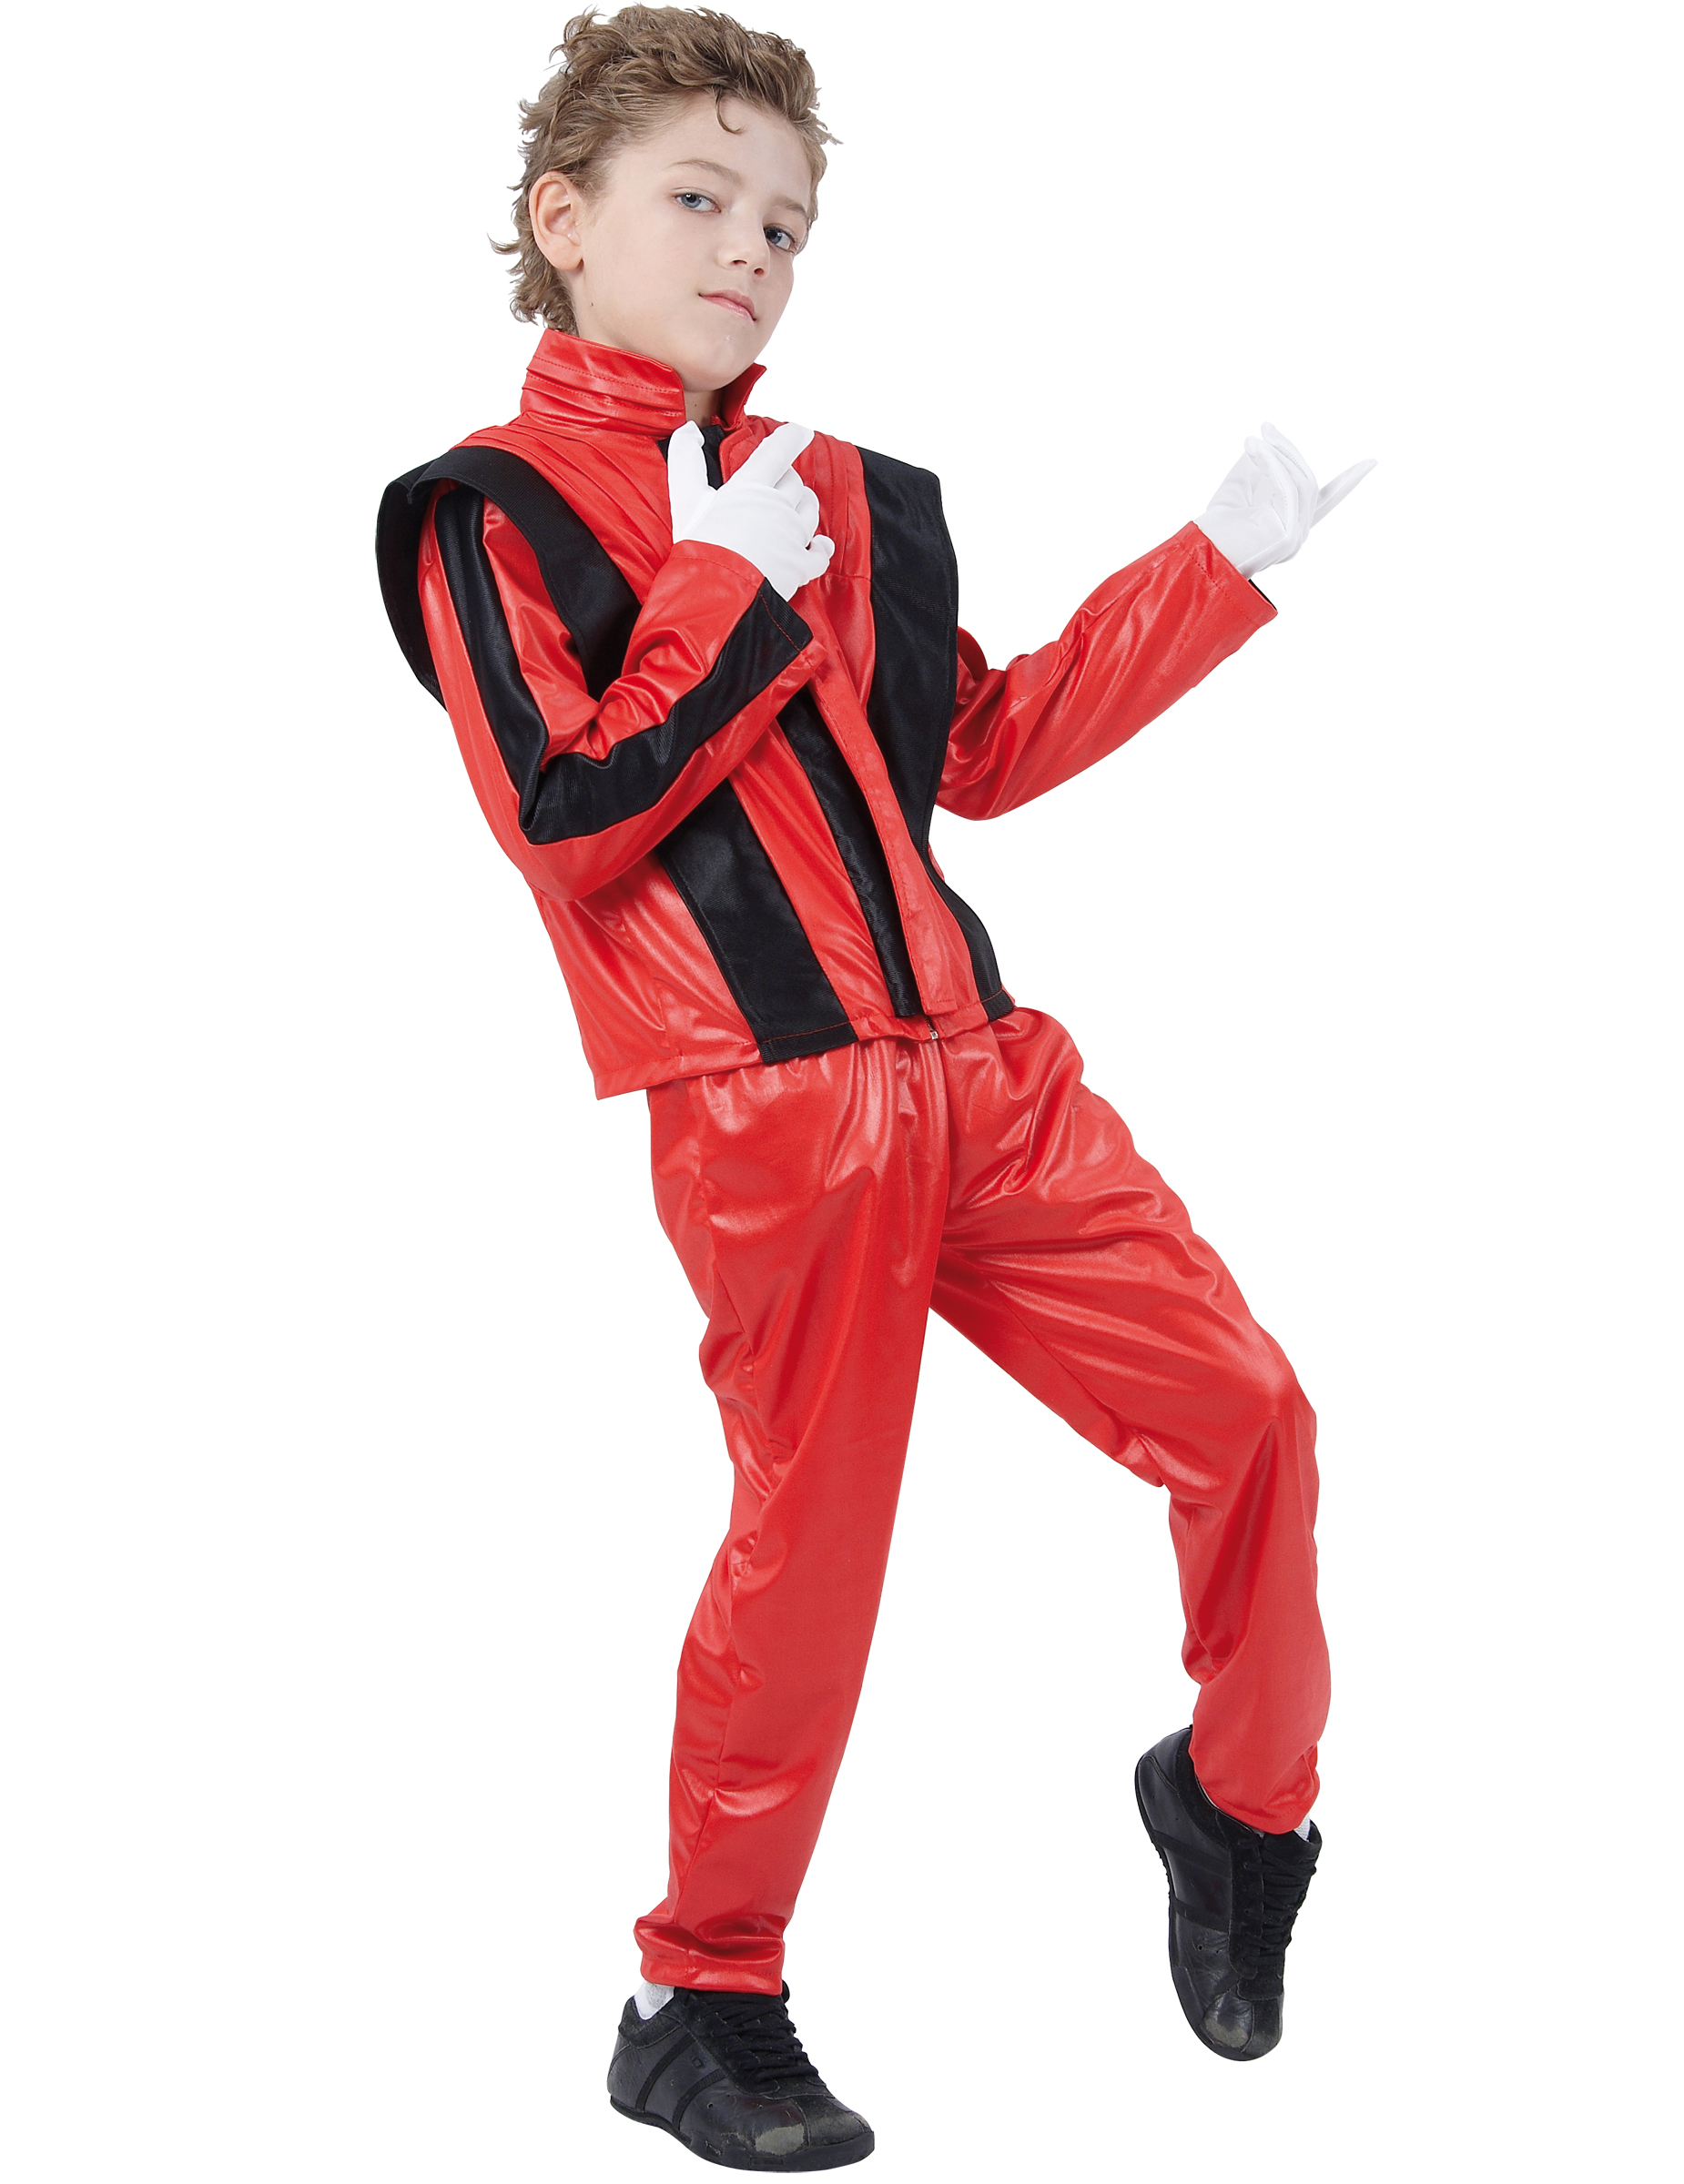 Popstar Kinderkostum Rockstar Kostum Fur Kids Rot Schwarz Gunstige